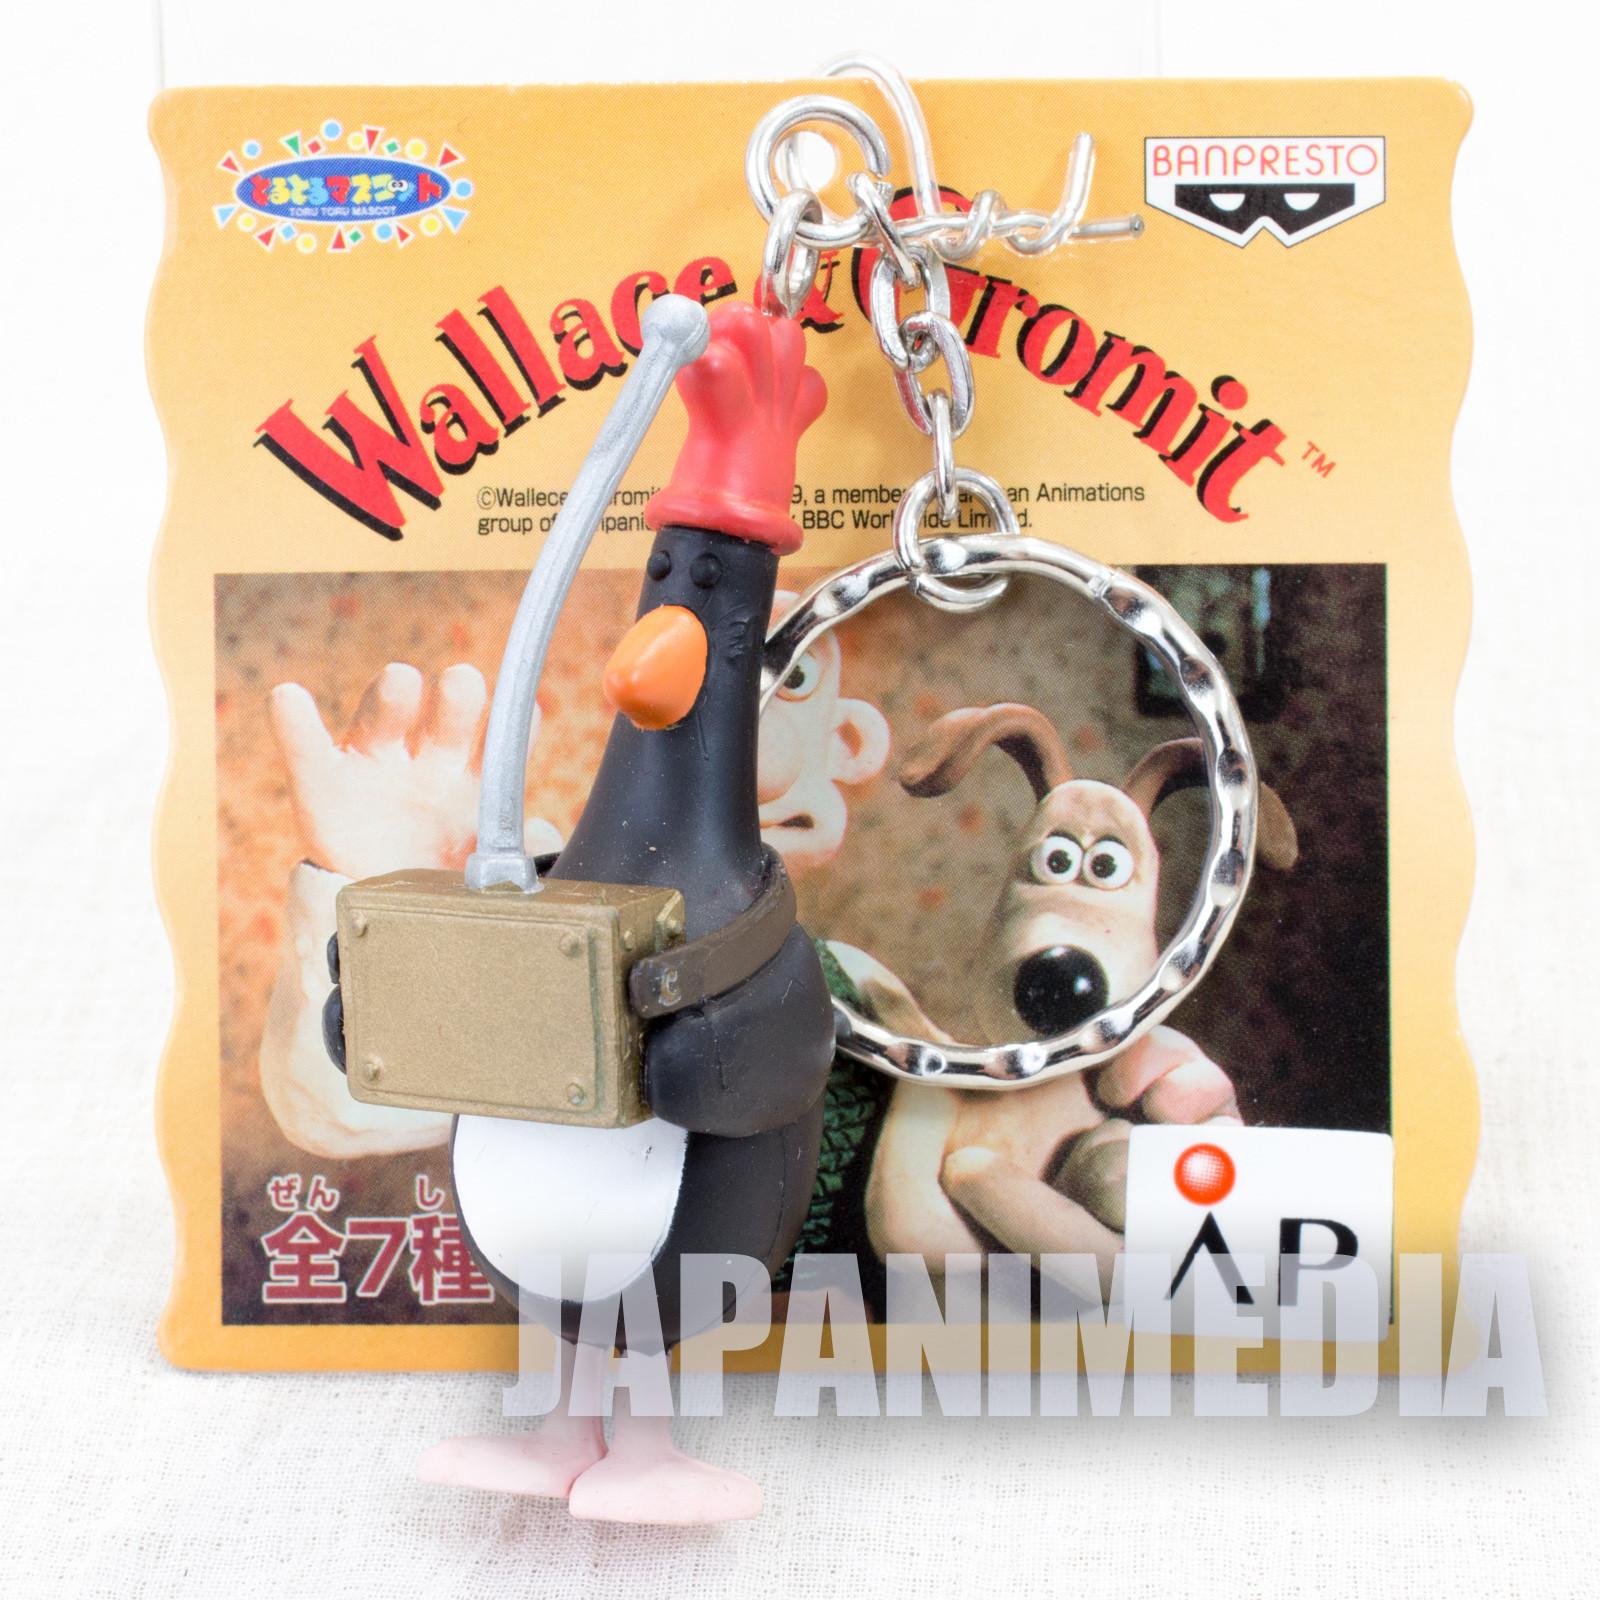 Wallace & Gromit Feathers McGraw Figure Key Chain Banpresto JAPAN Ardman ANIME